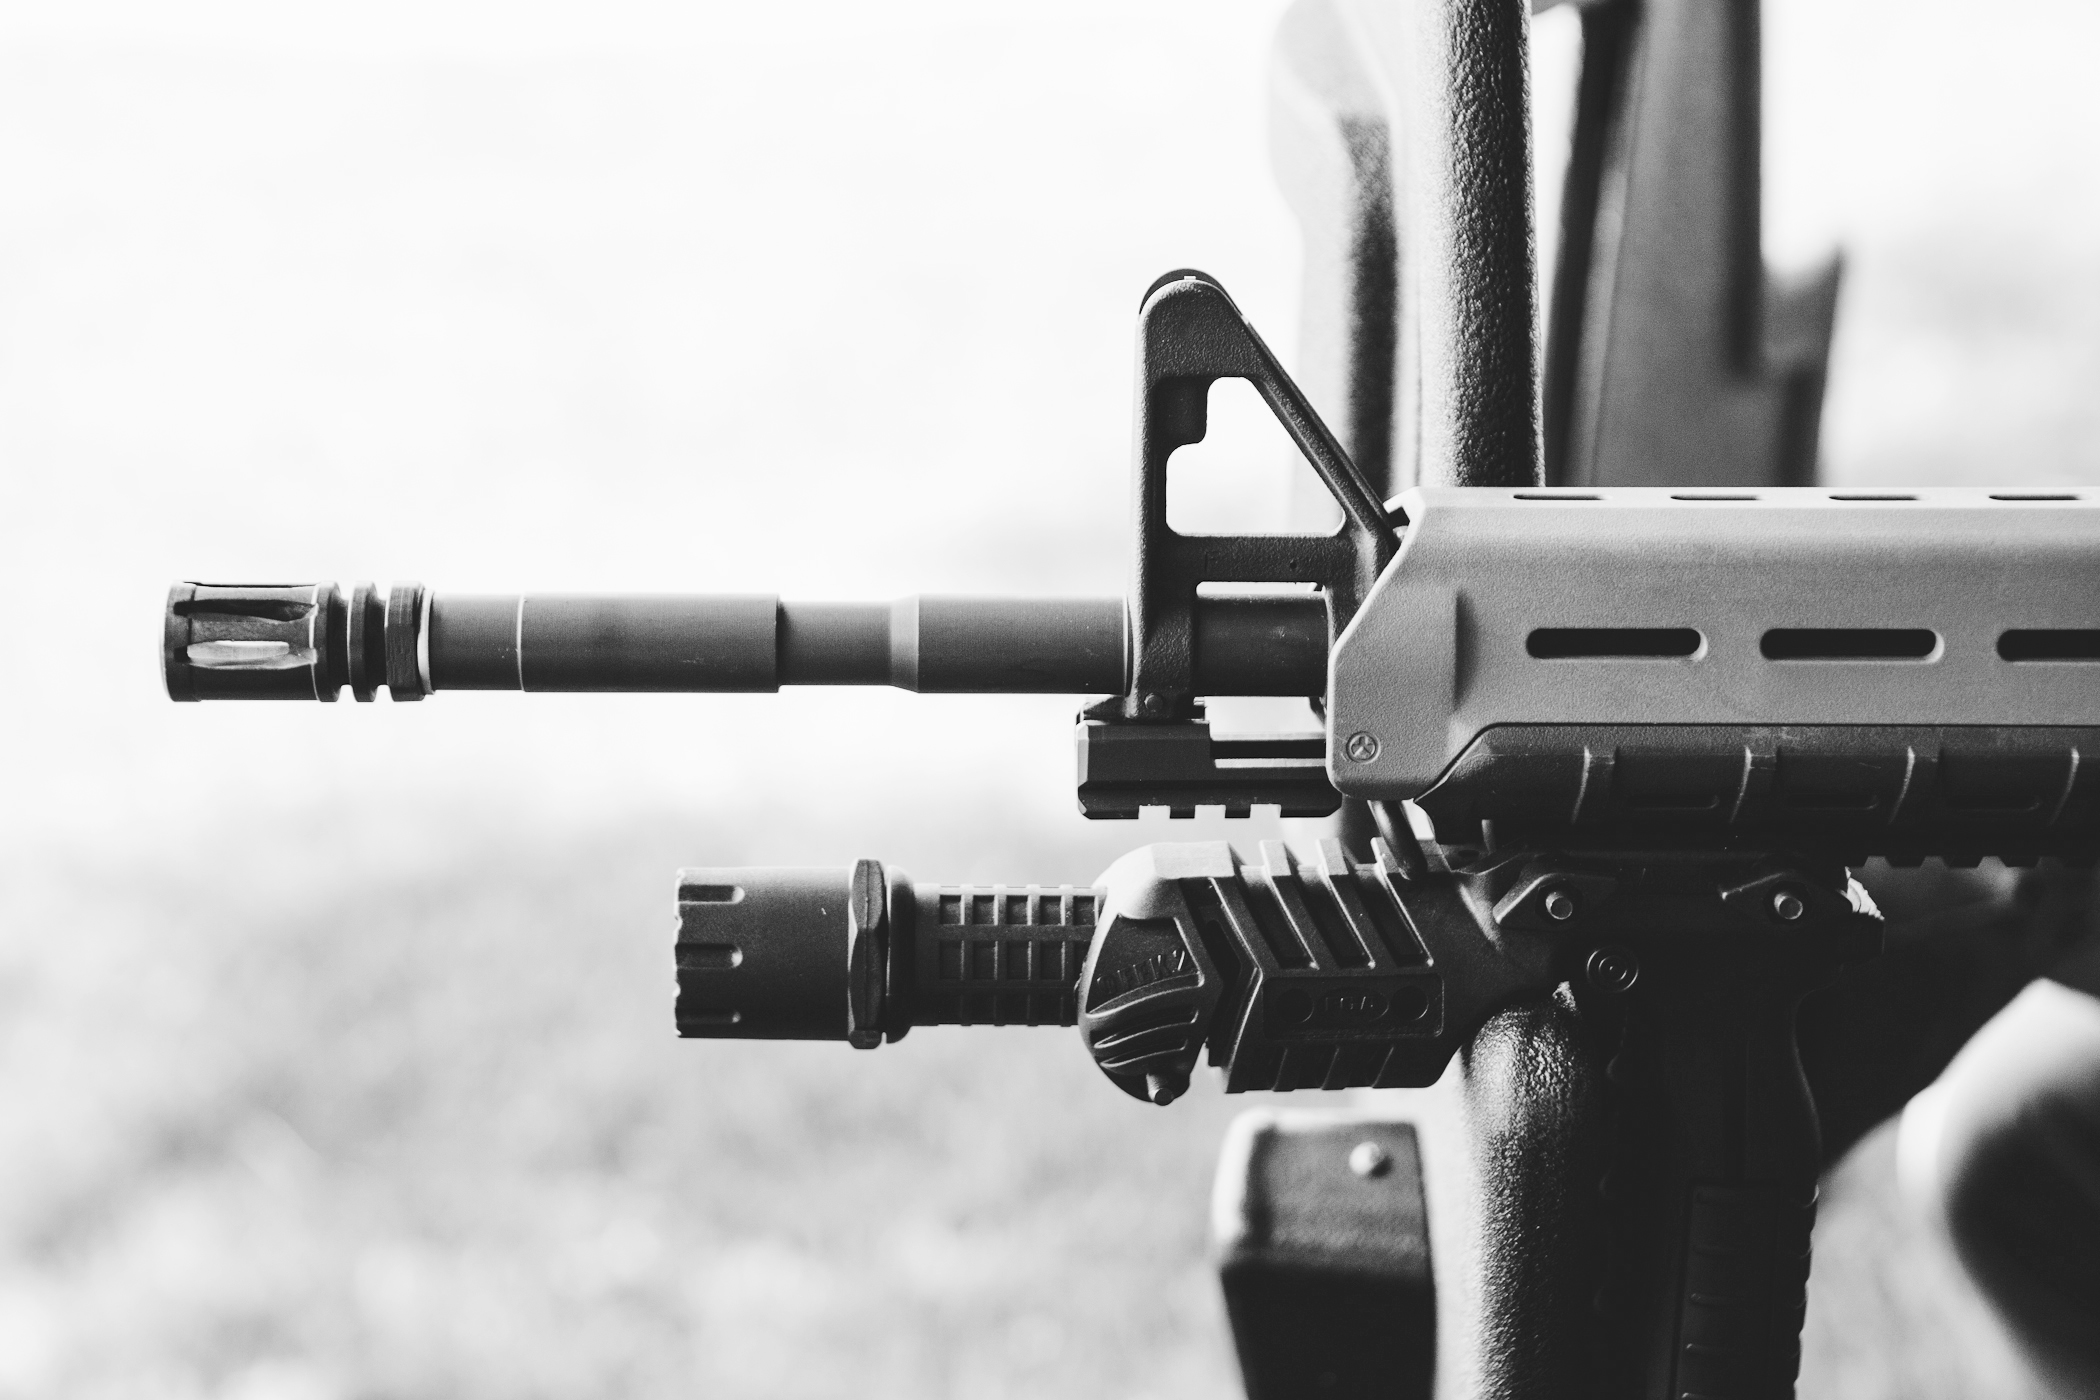 rifle_6.jpg